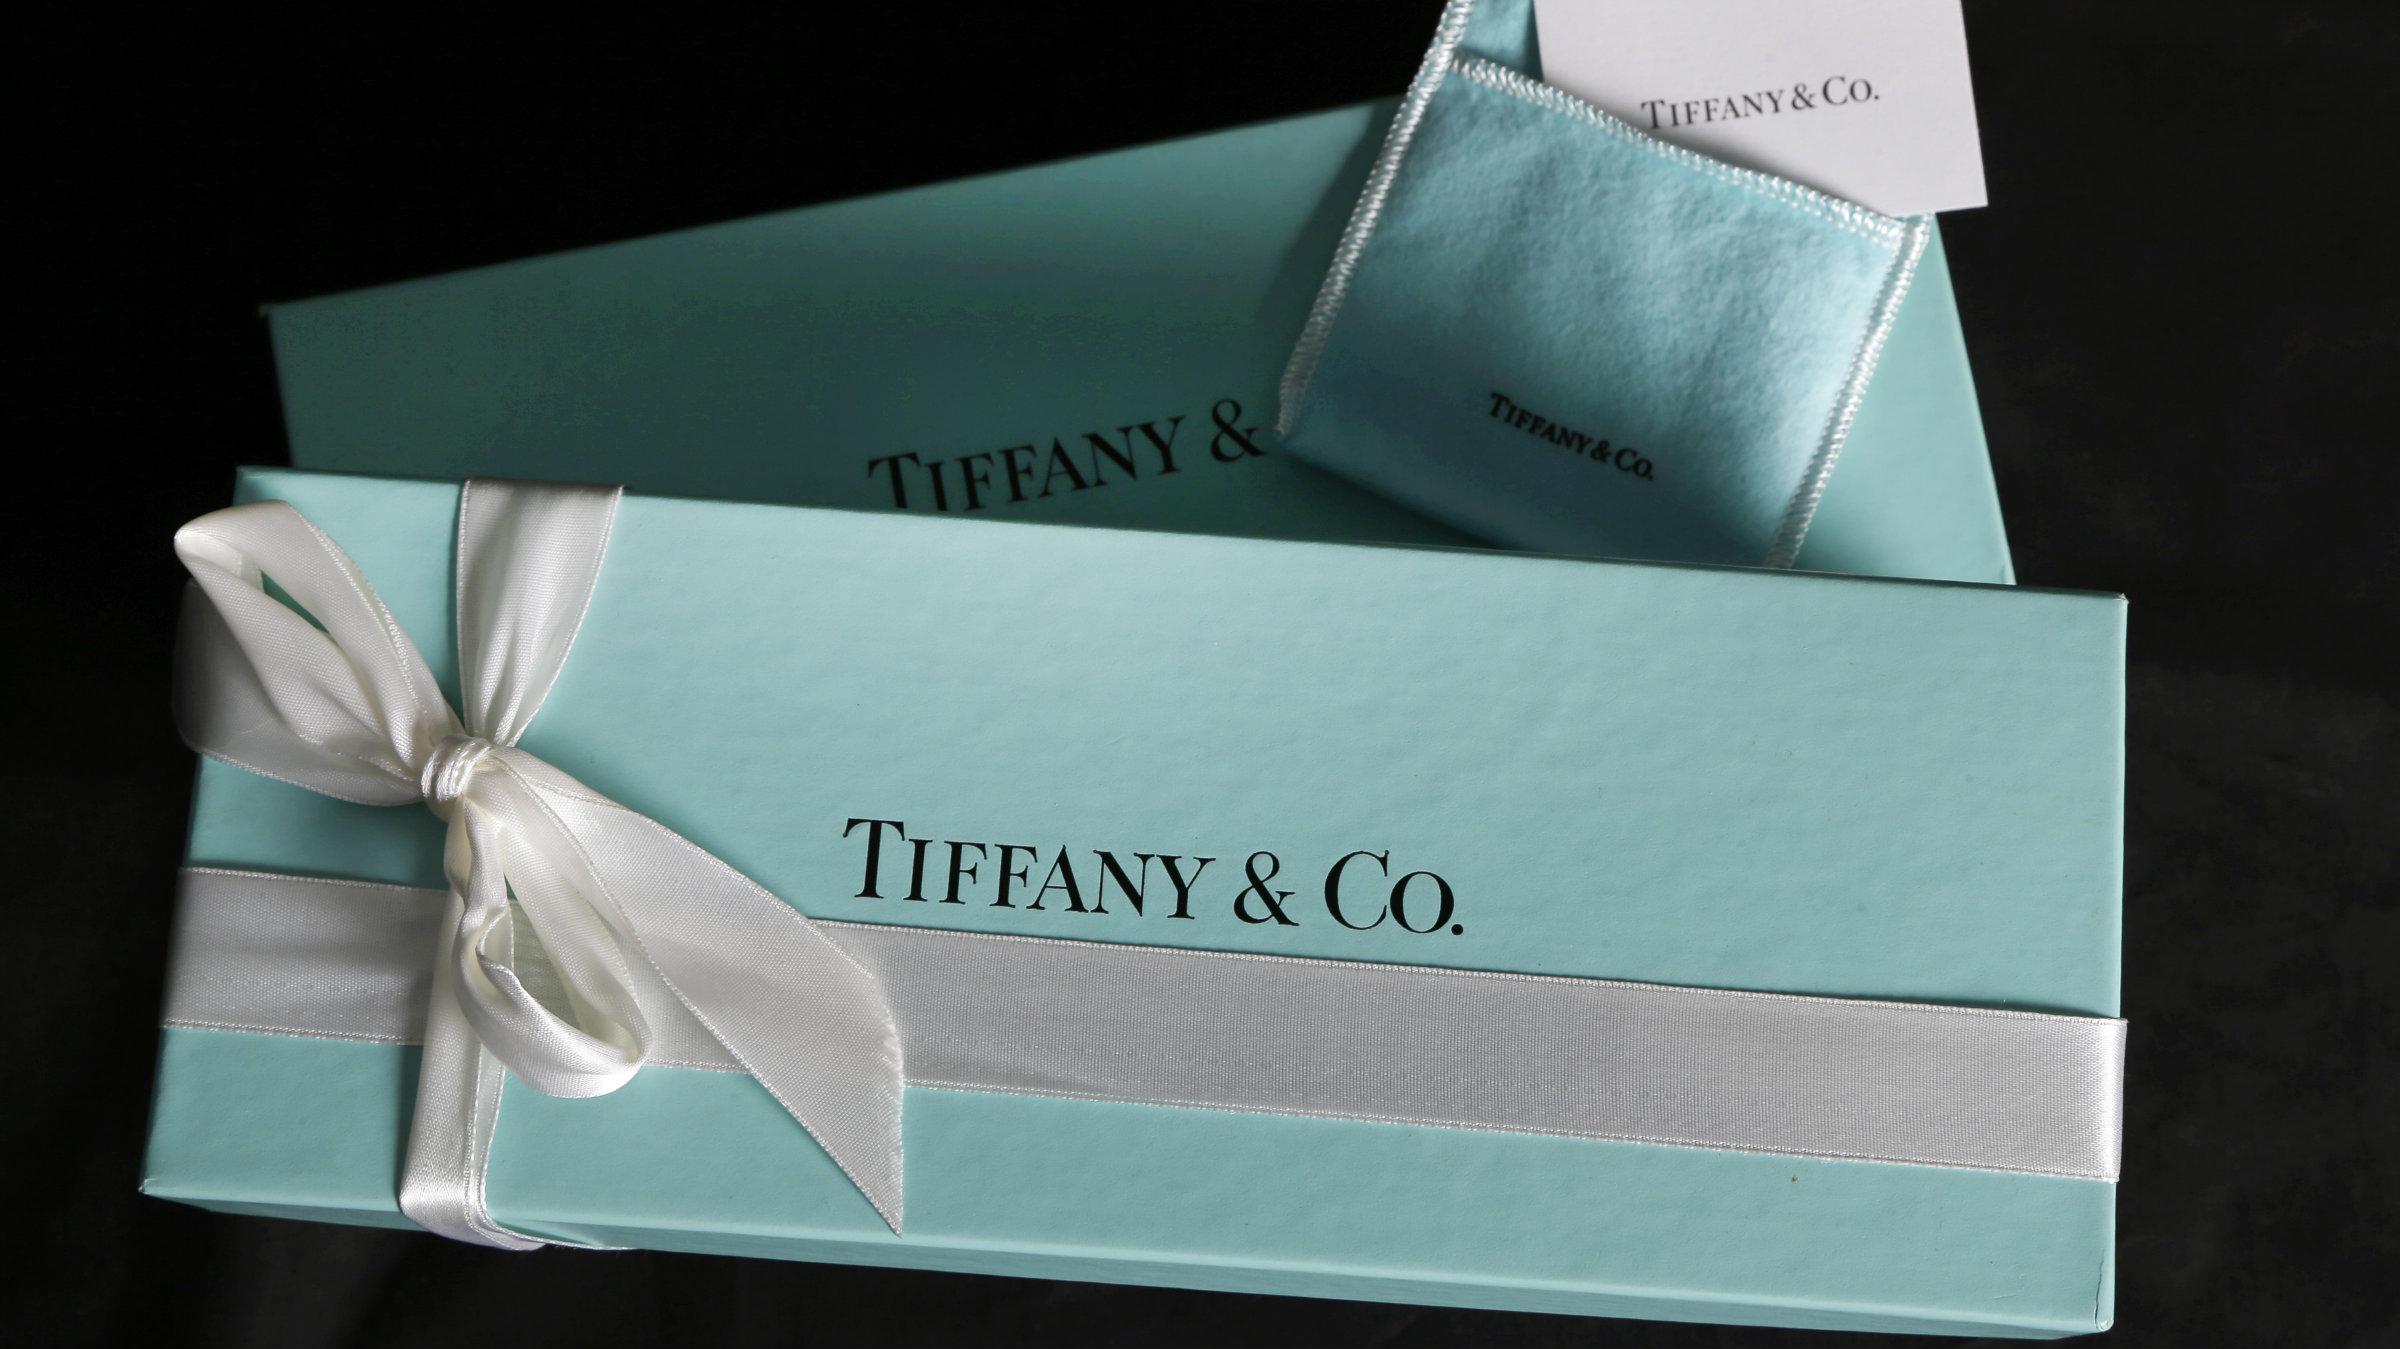 Tiffany U2019s Blue Boxes Are Red Hot On The Black Market  U2014 Quartz